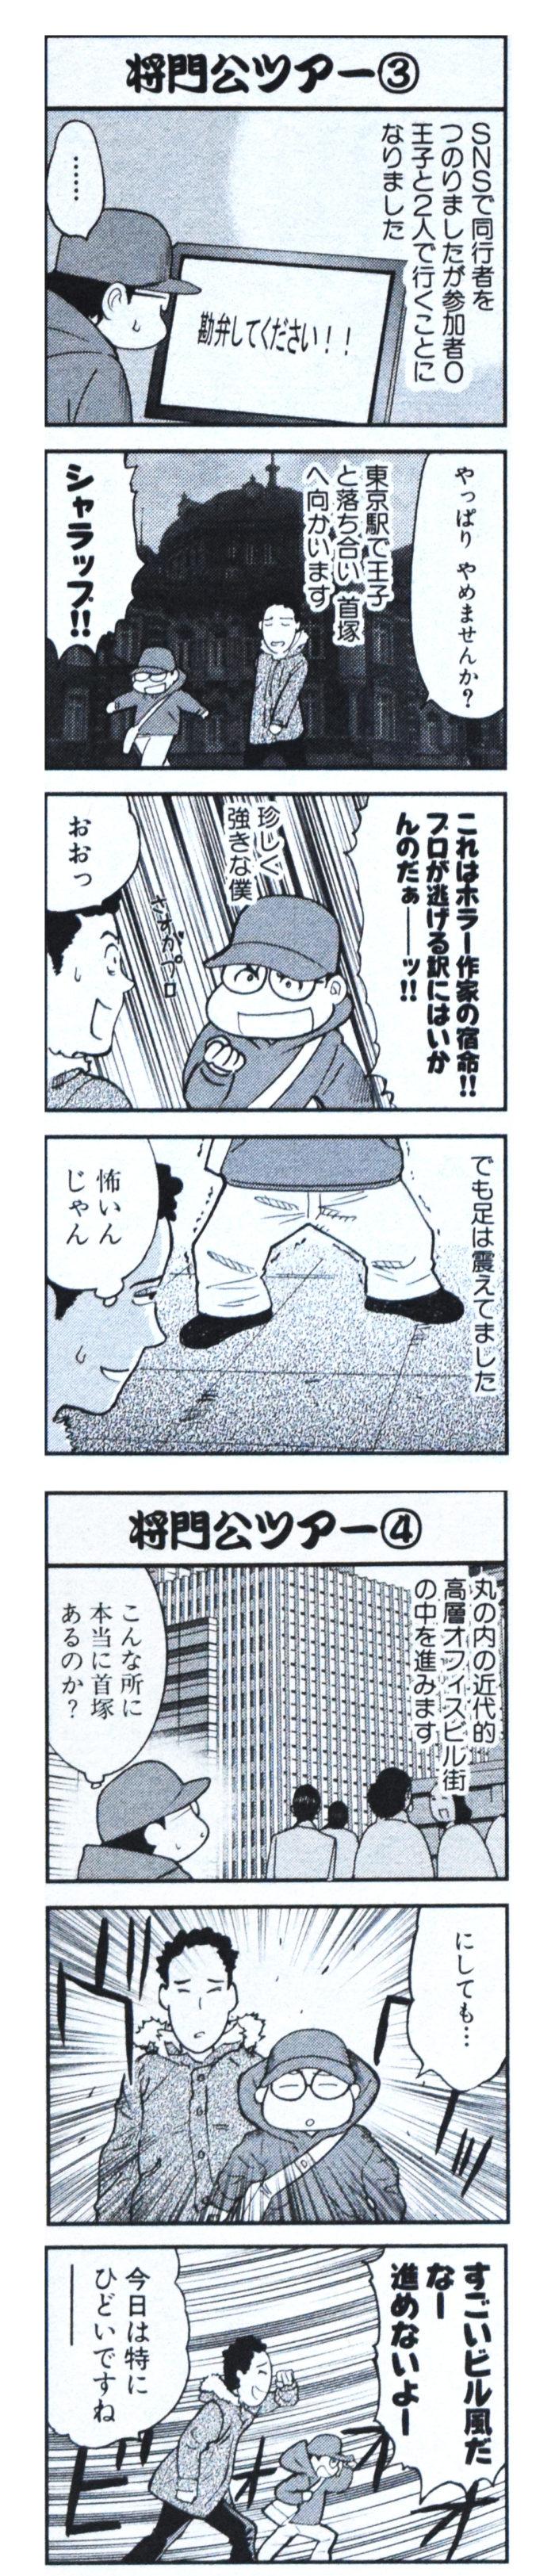 torihada-syoumon2-01